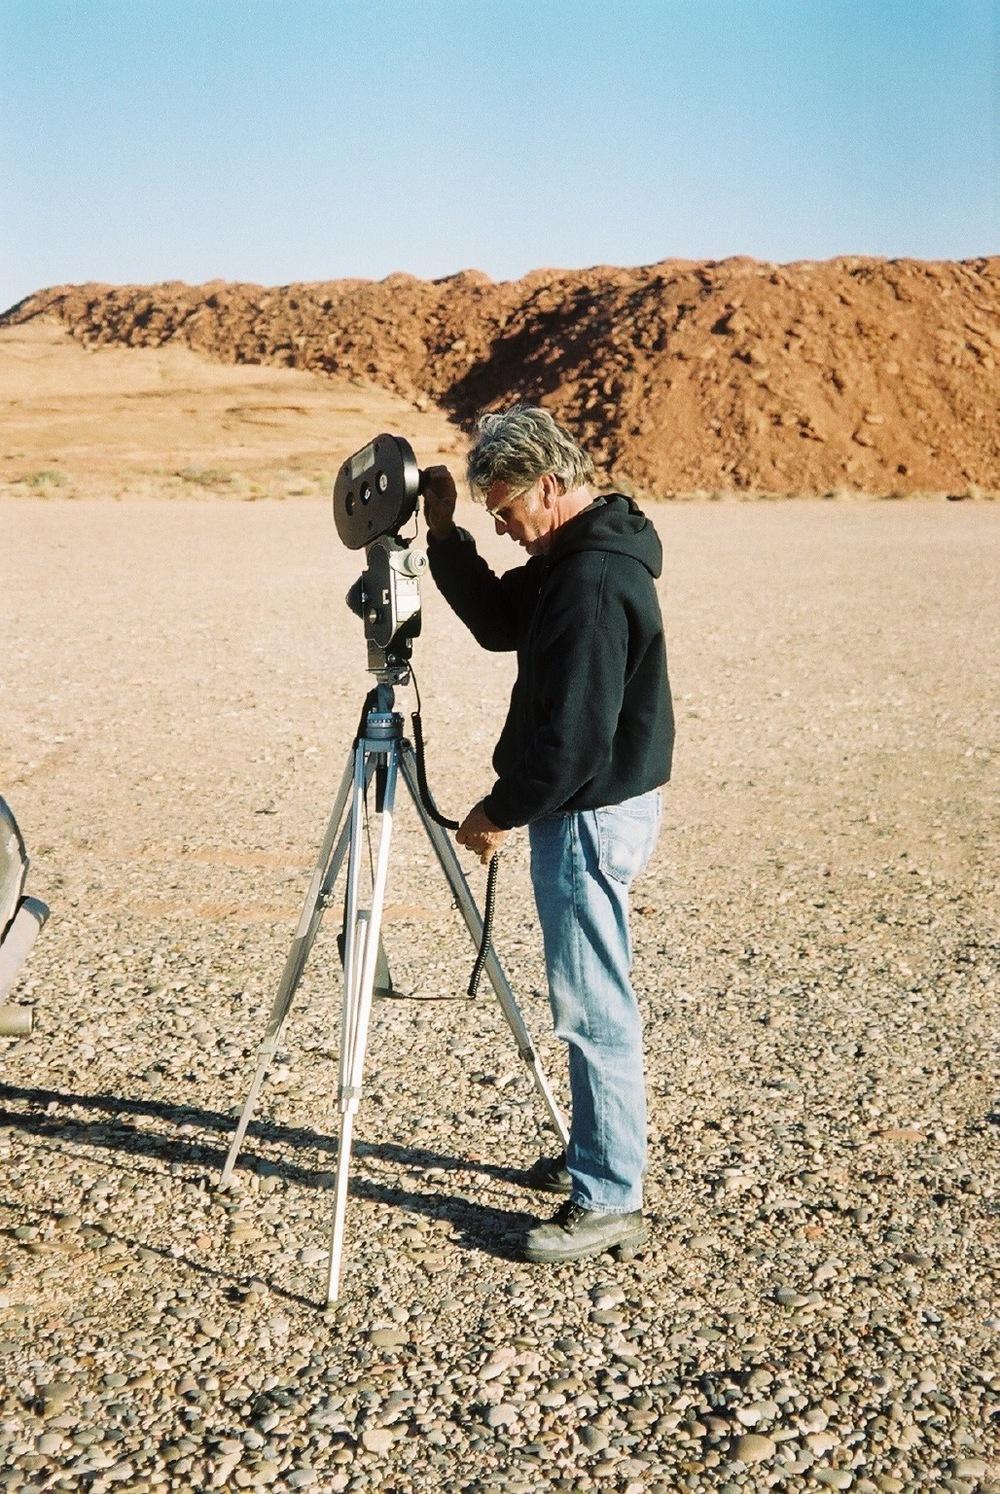 James Benning with camera.